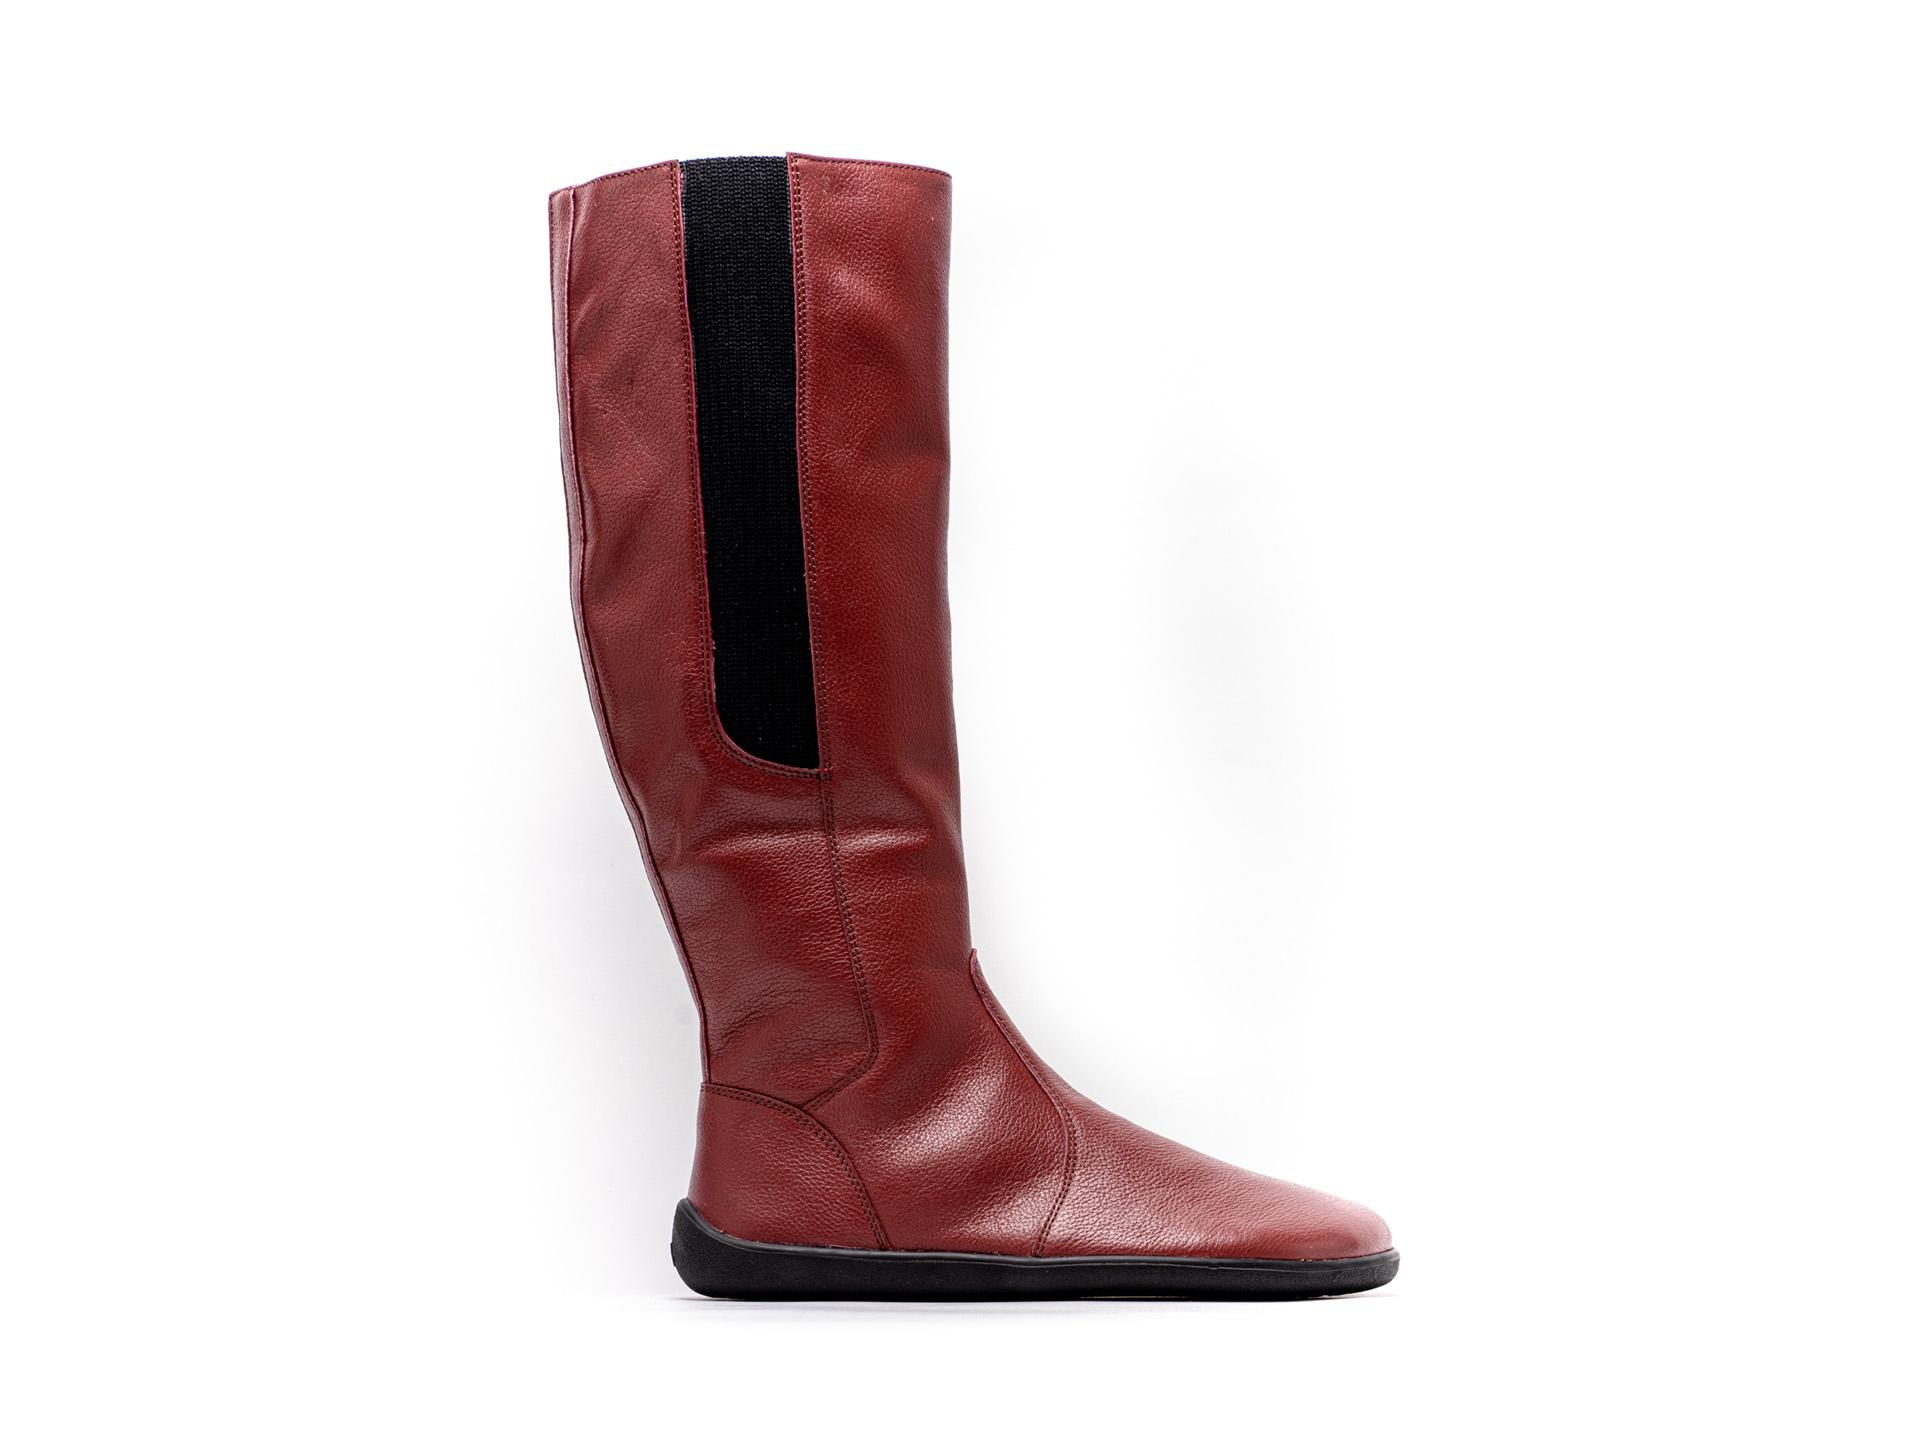 Barefoot long boots – Be Lenka Sierra - Ruby 39